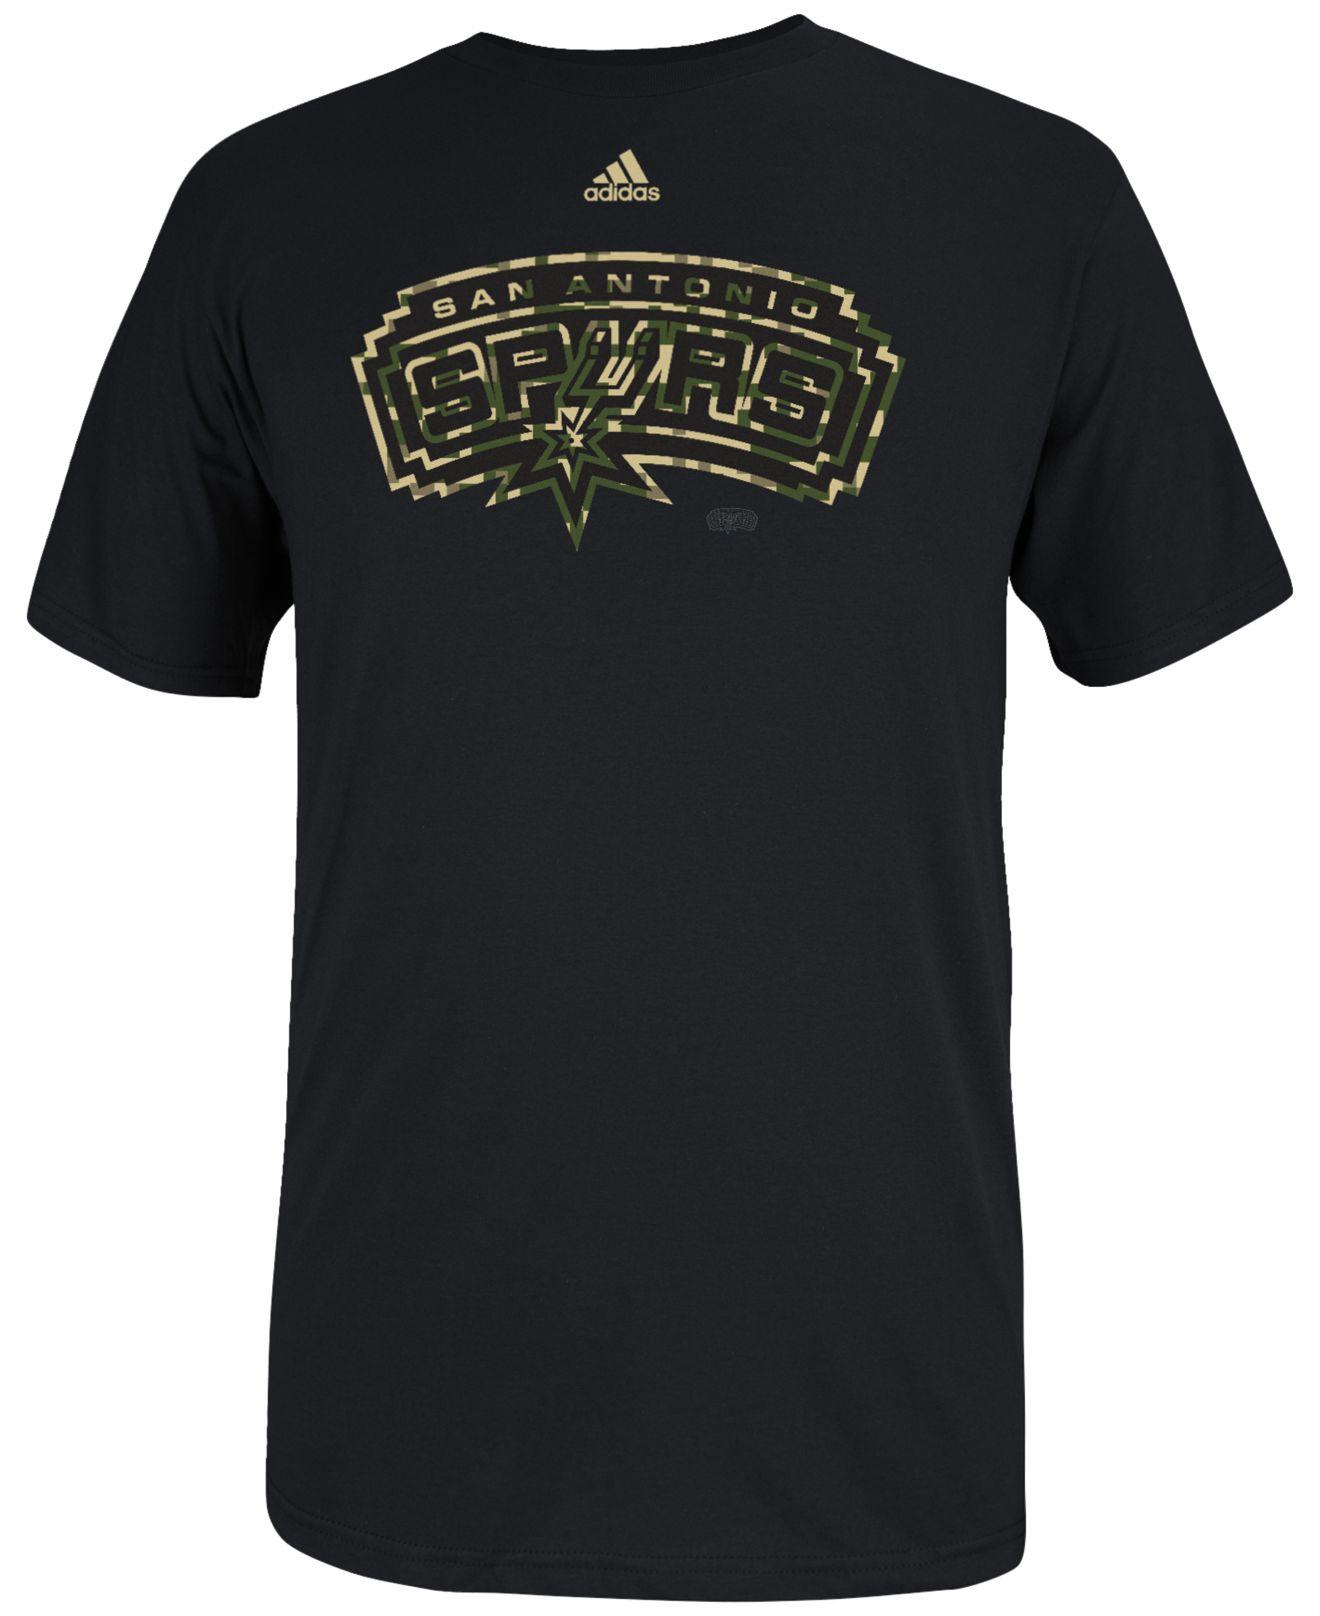 Adidas originals men 39 s san antonio spurs pride logo t for Screen print shirts san antonio